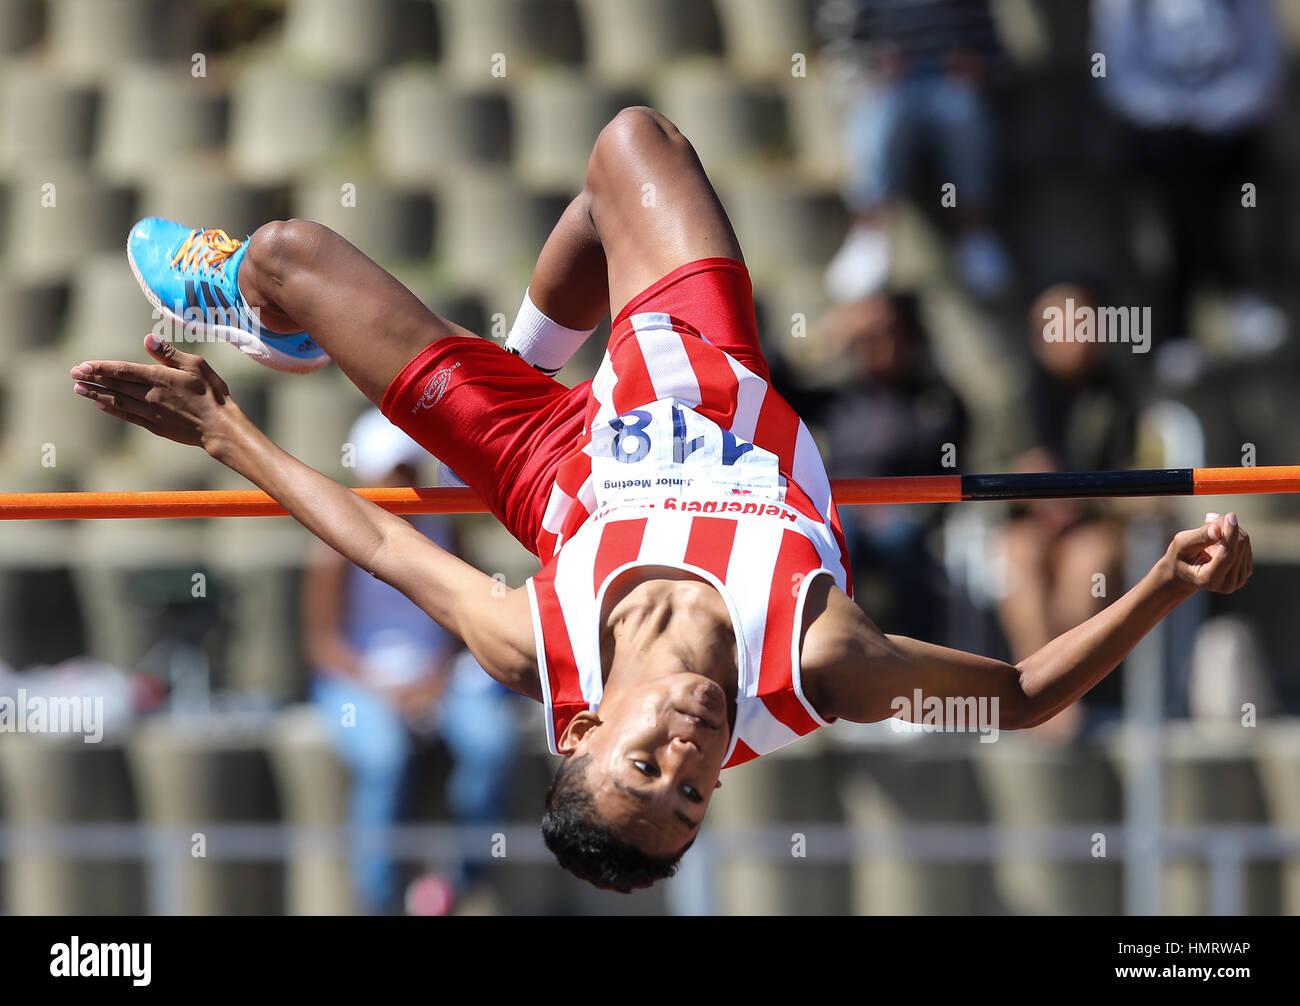 Pista y Campo de atletismo local reunión en Parow, Cape Town, Sudáfrica Imagen De Stock